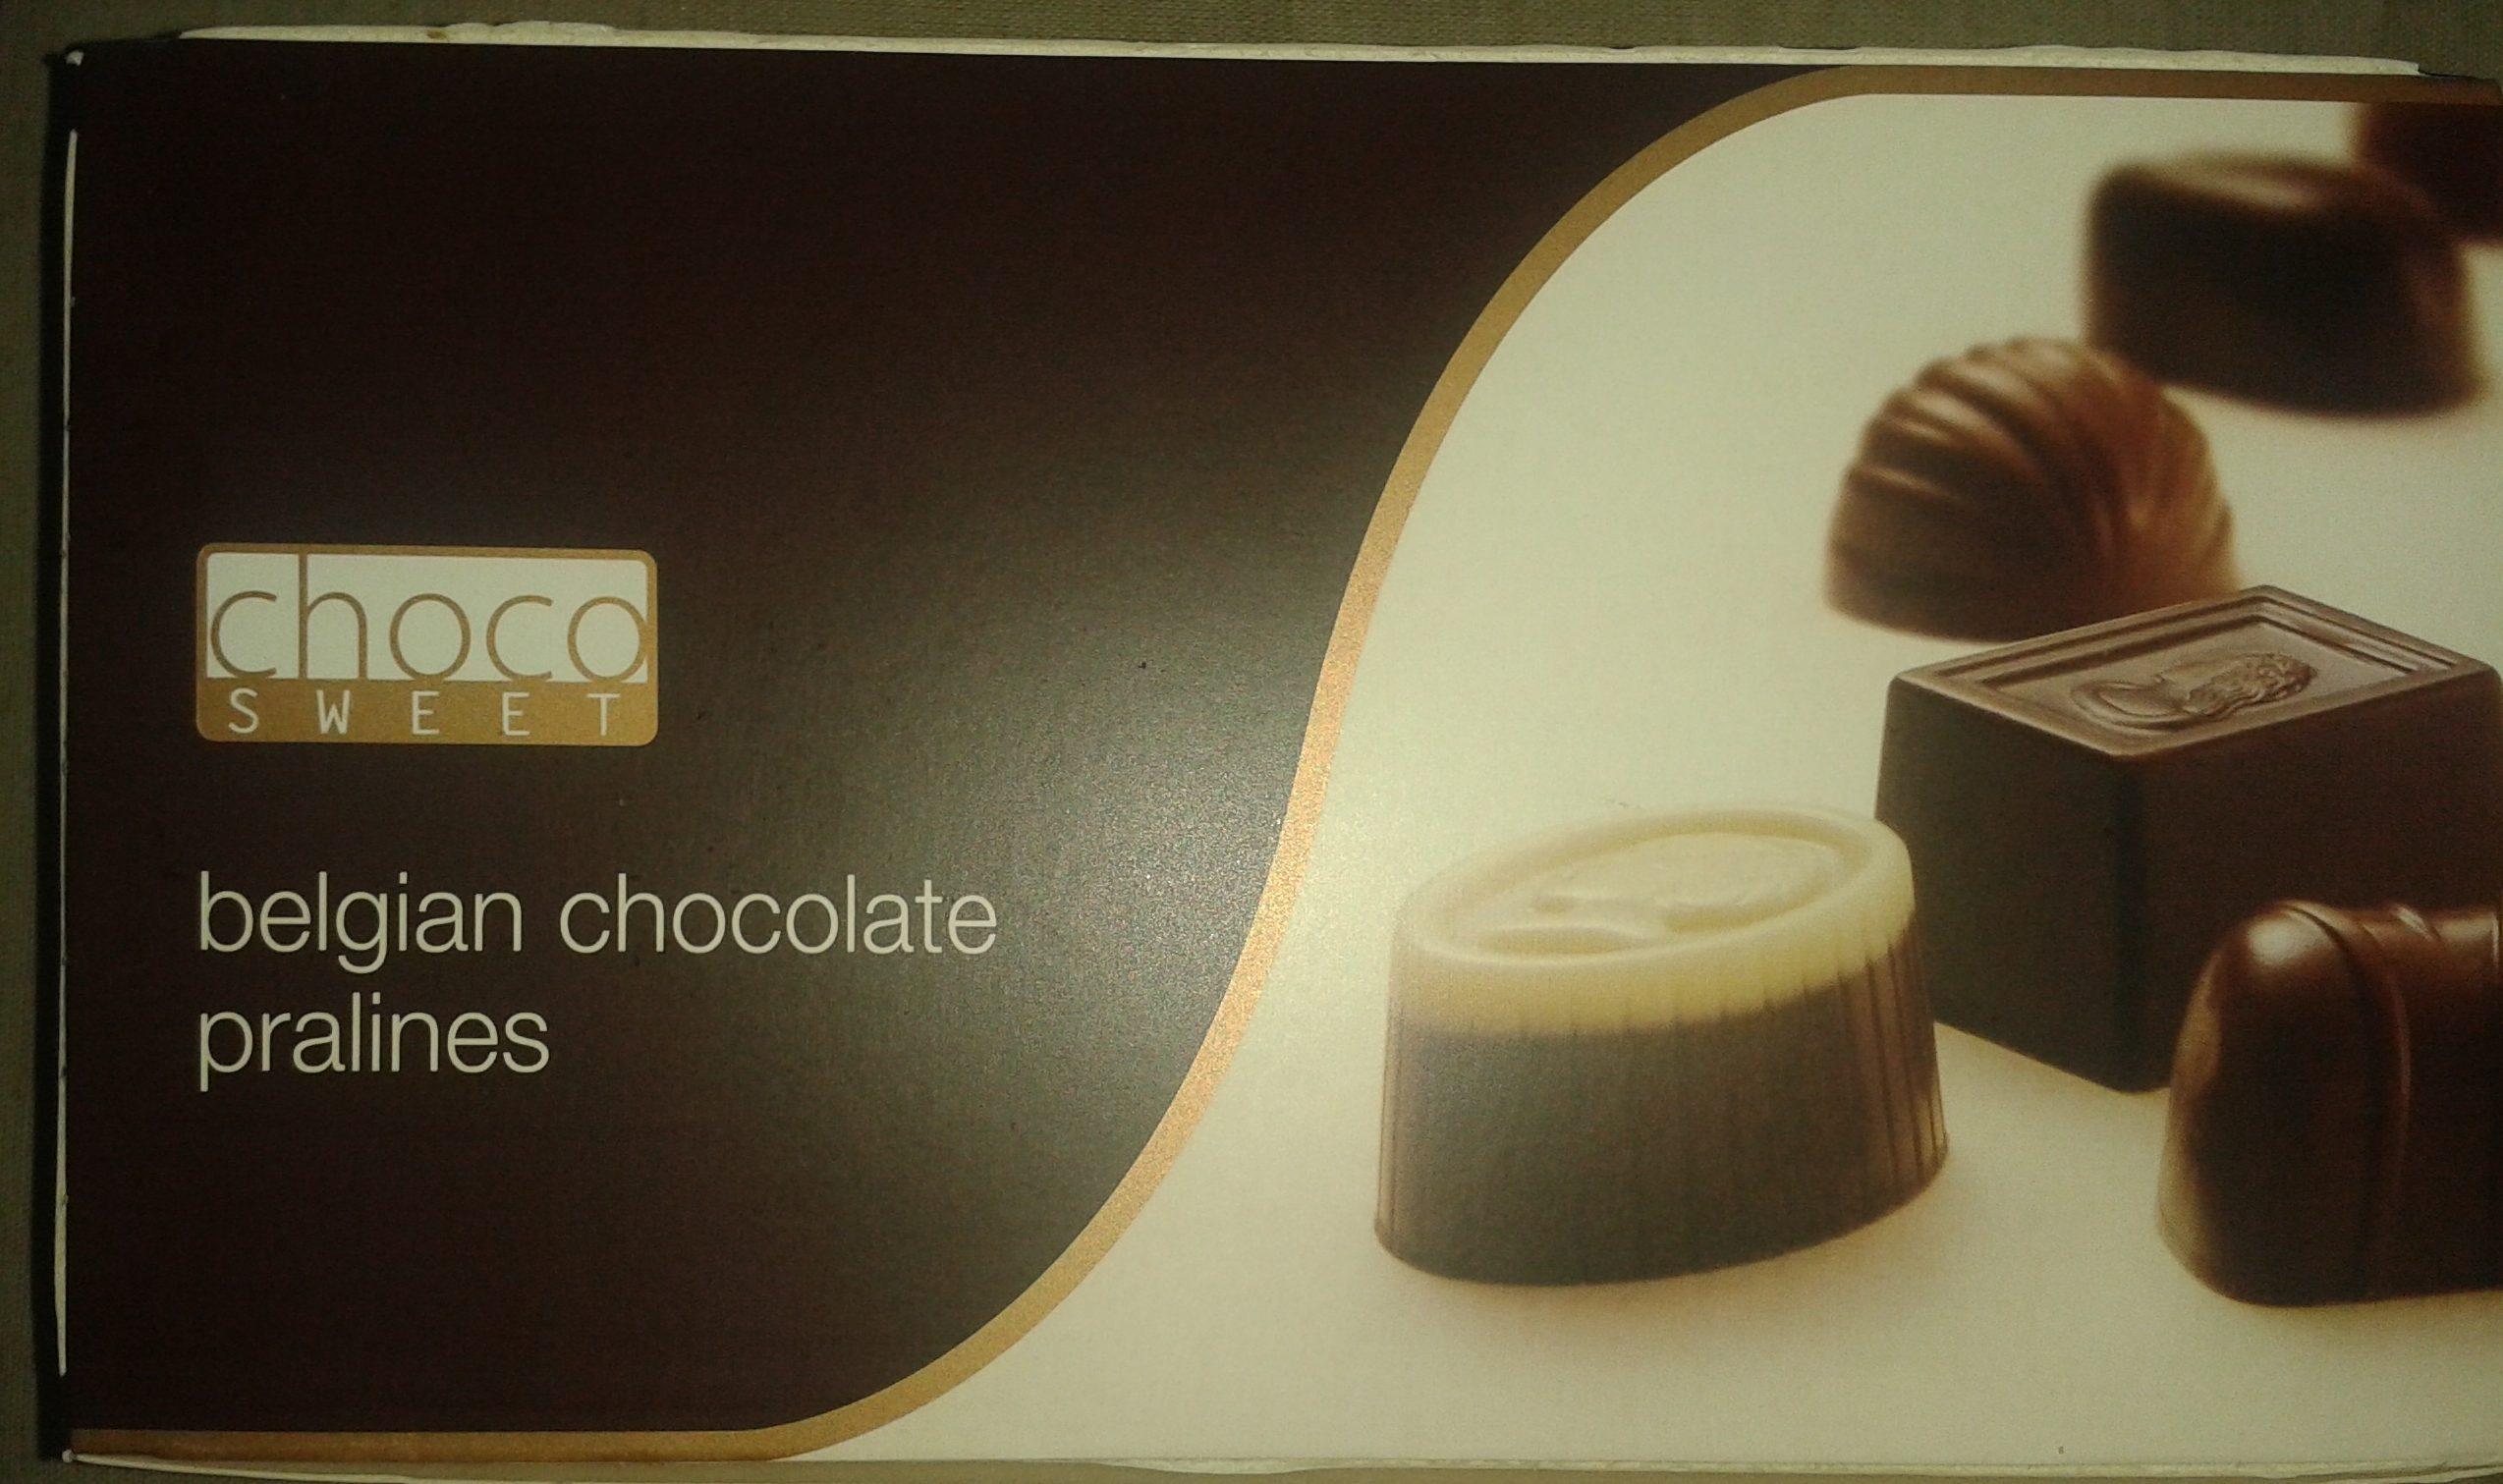 Belgian chocolate pralines - Product